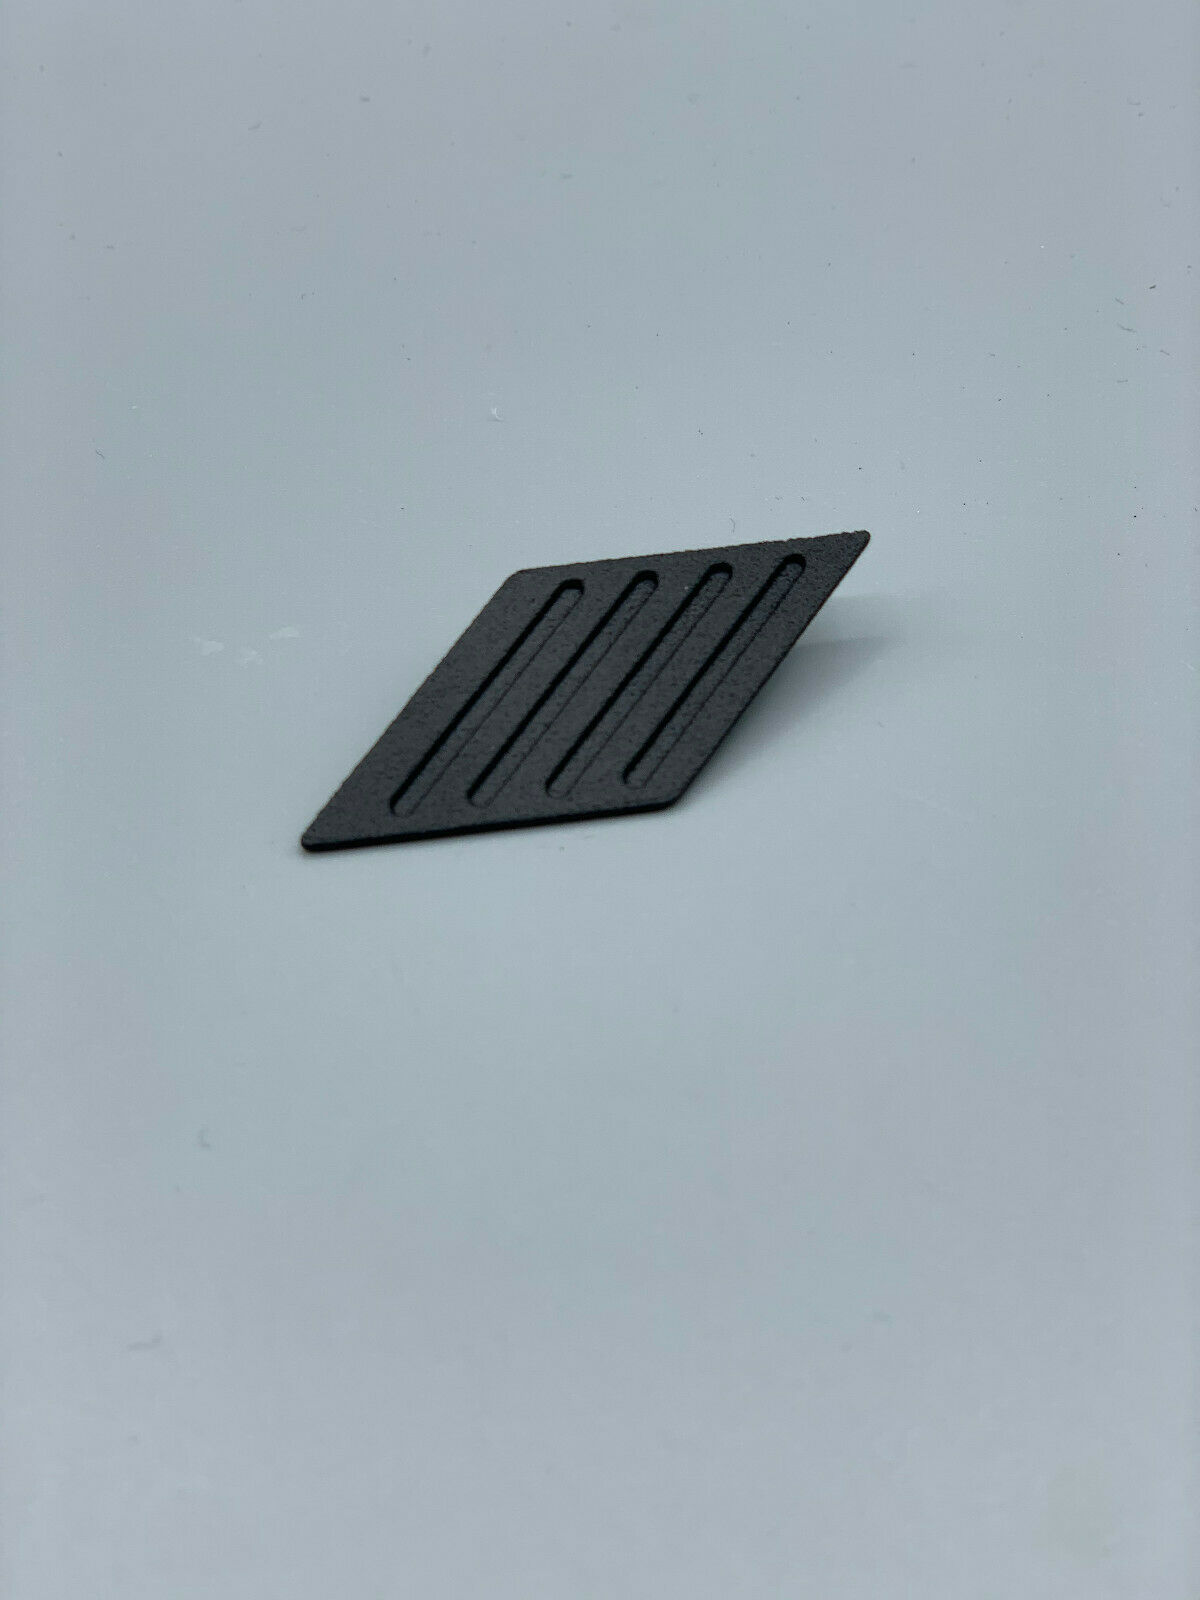 Shining 3D einscan Pro Handheld Cover Panel Interface Cap Cap Cover